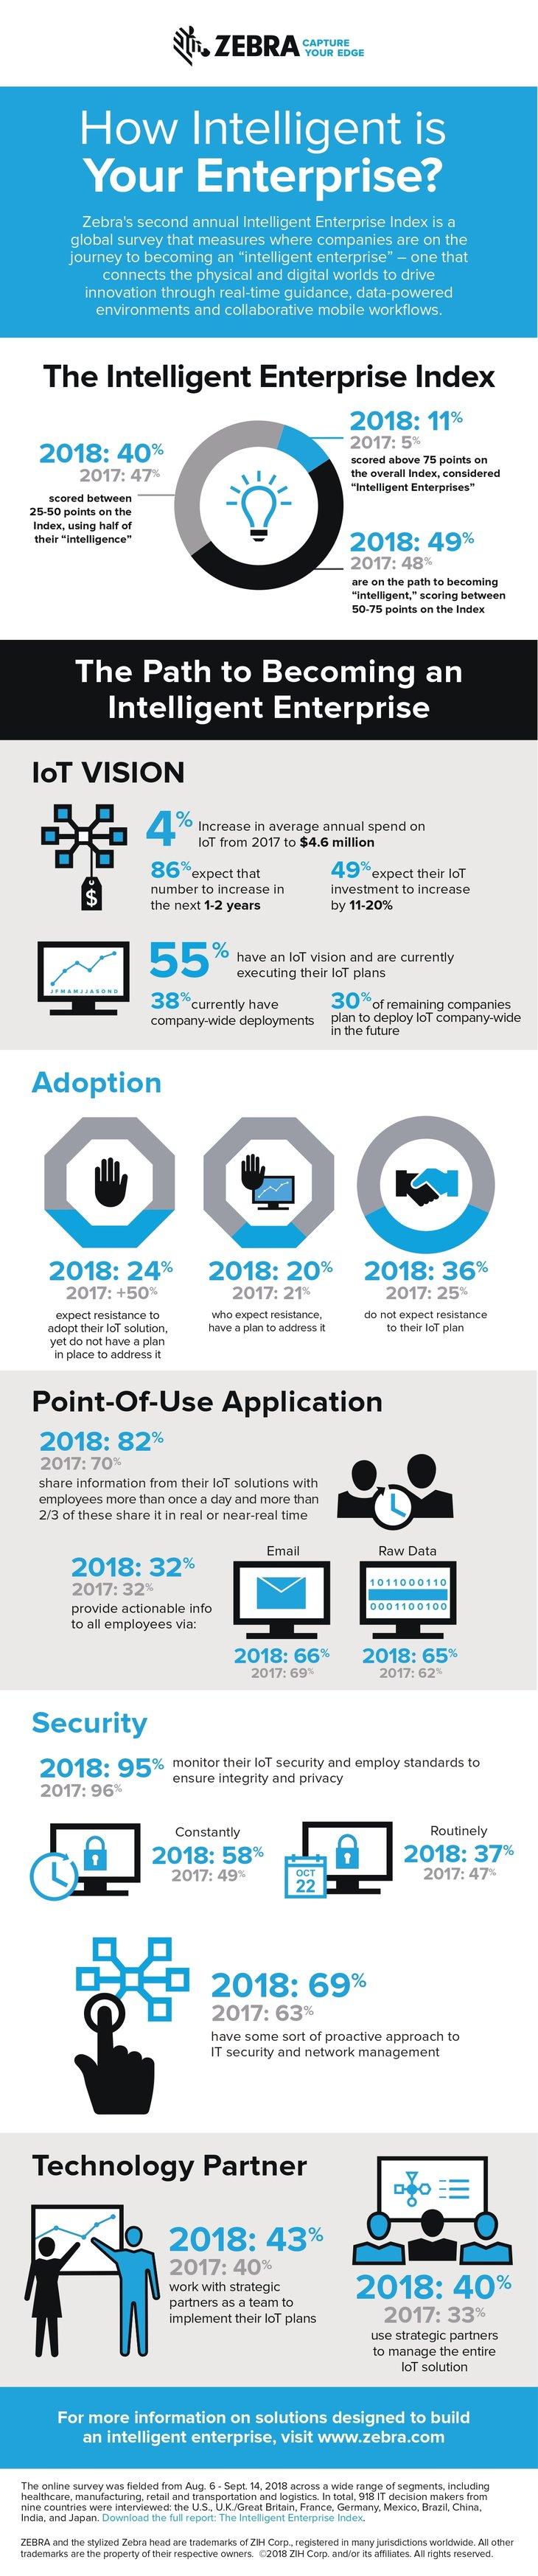 2019 Zebra - SUPPLY CHAIN How-intelligent-enterprise-survey-infographic_1